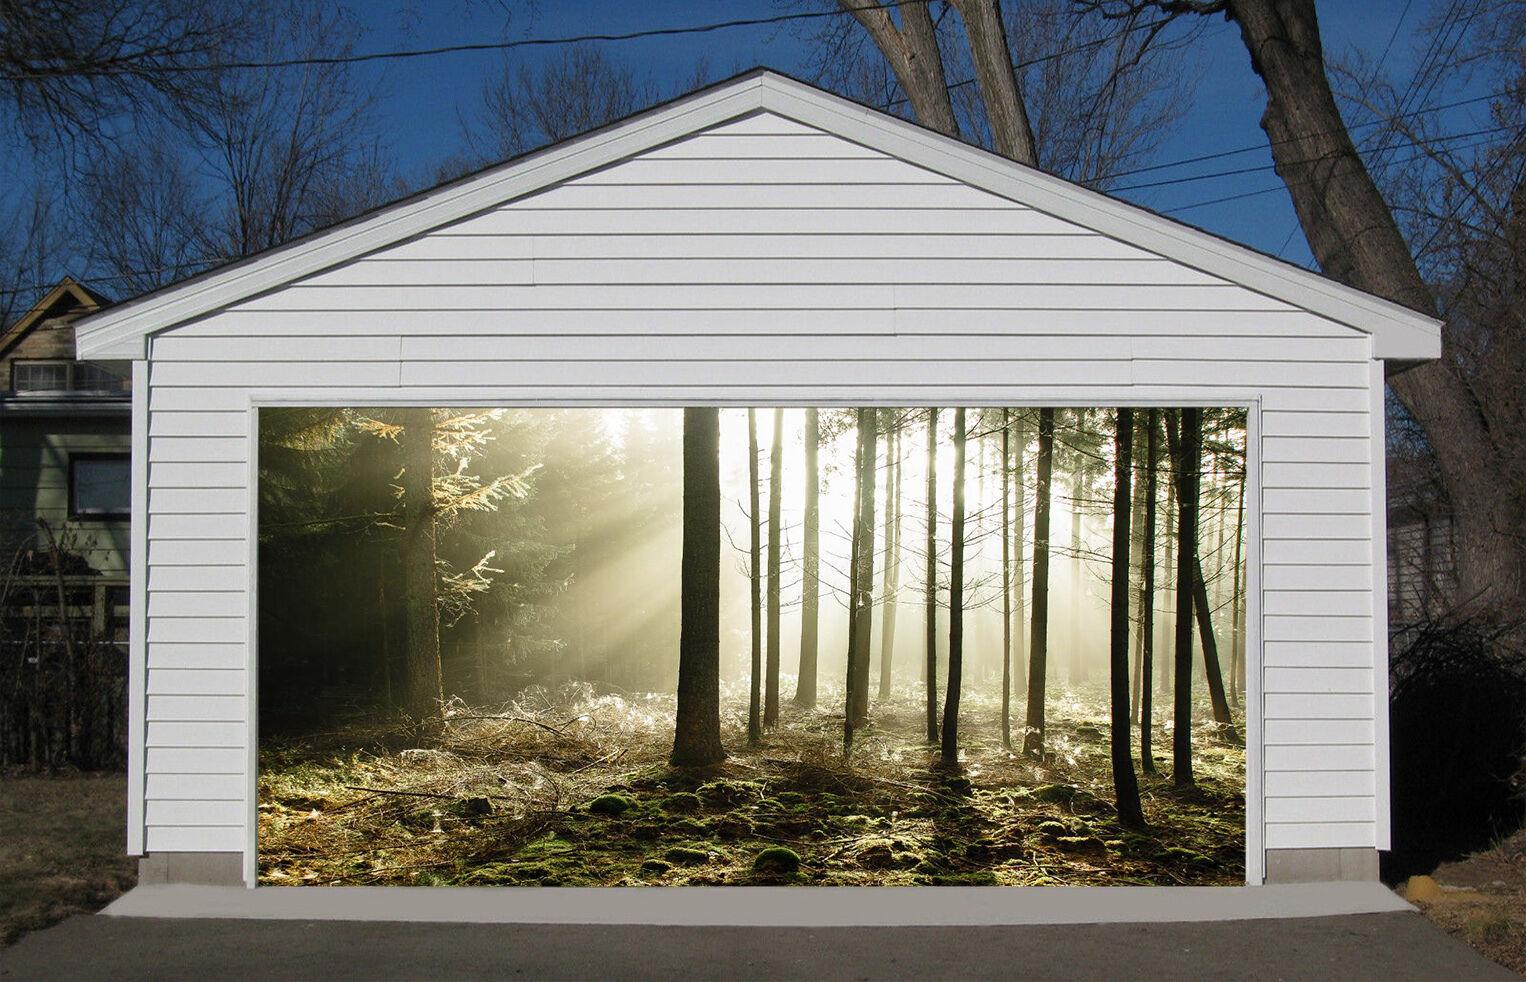 3D Sunny Forest 37 Garage Door Murals Wall Print Decal Wall Deco AJ WALLPAPER IE